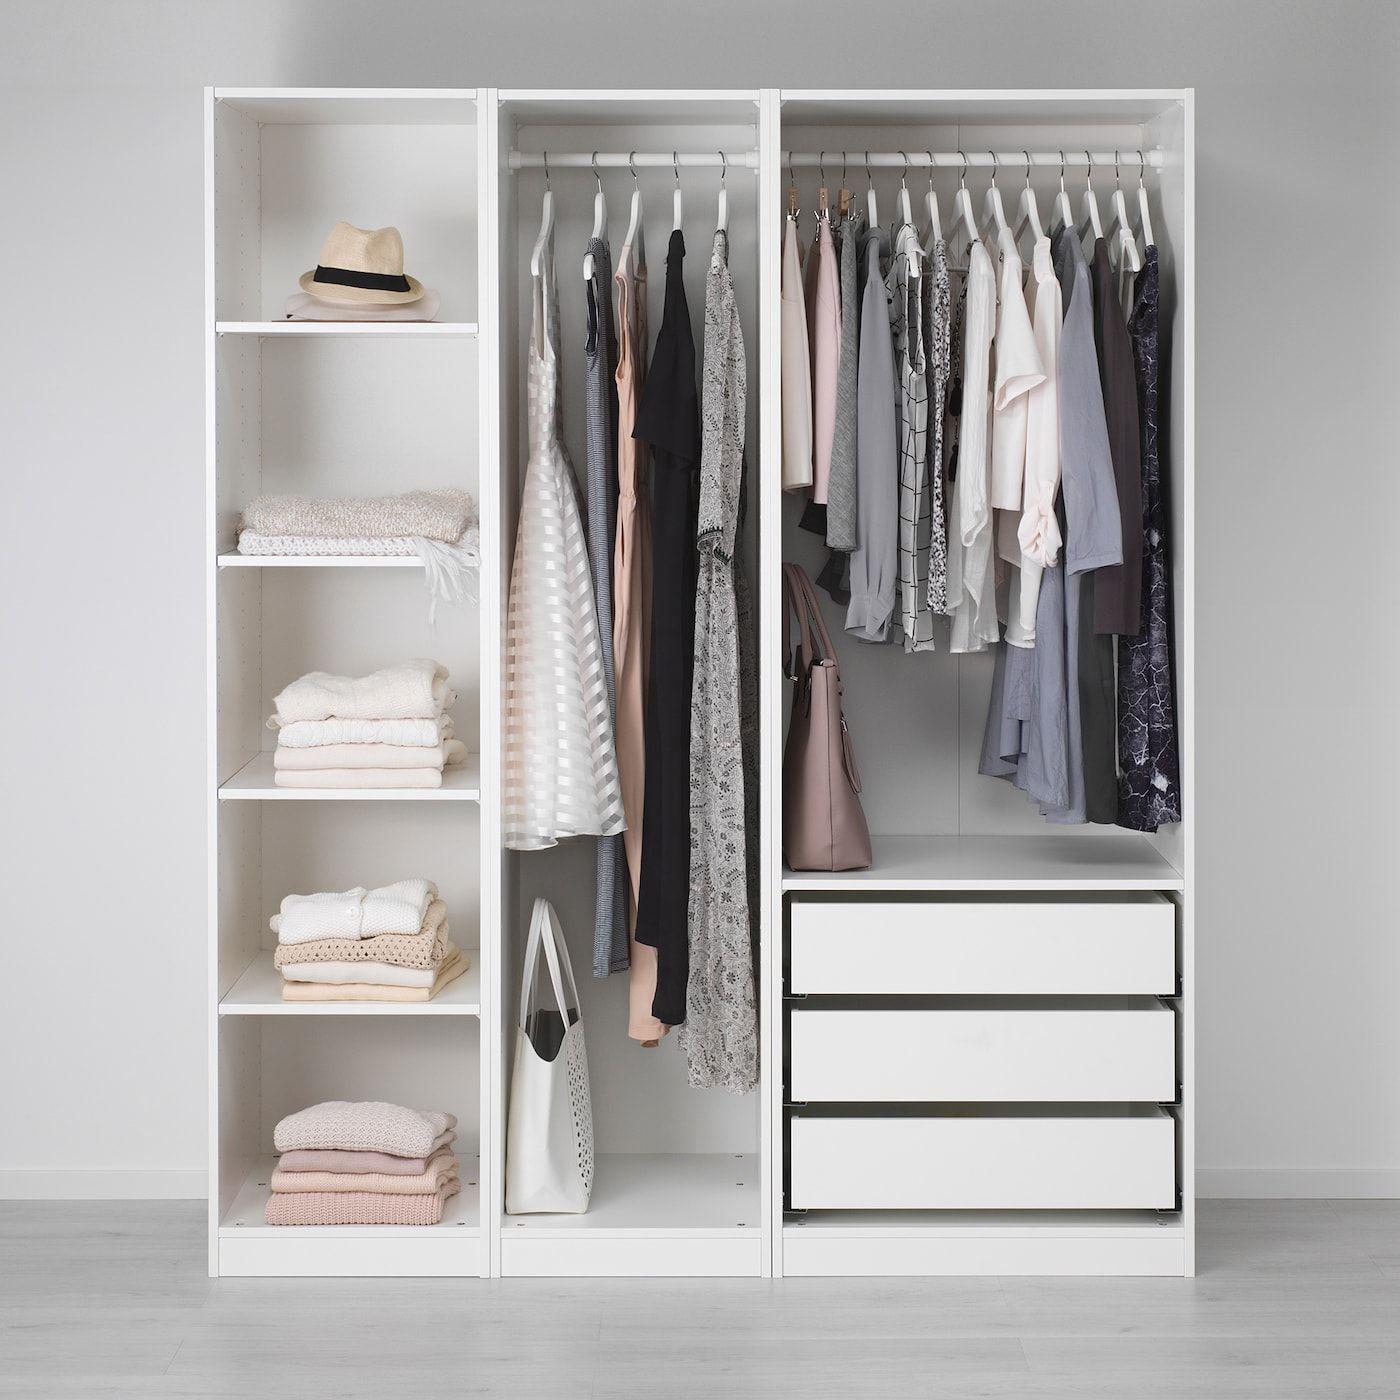 Pax Wardrobe White 68 7 8x22 7 8x79 1 4 In 2020 Ikea Pax